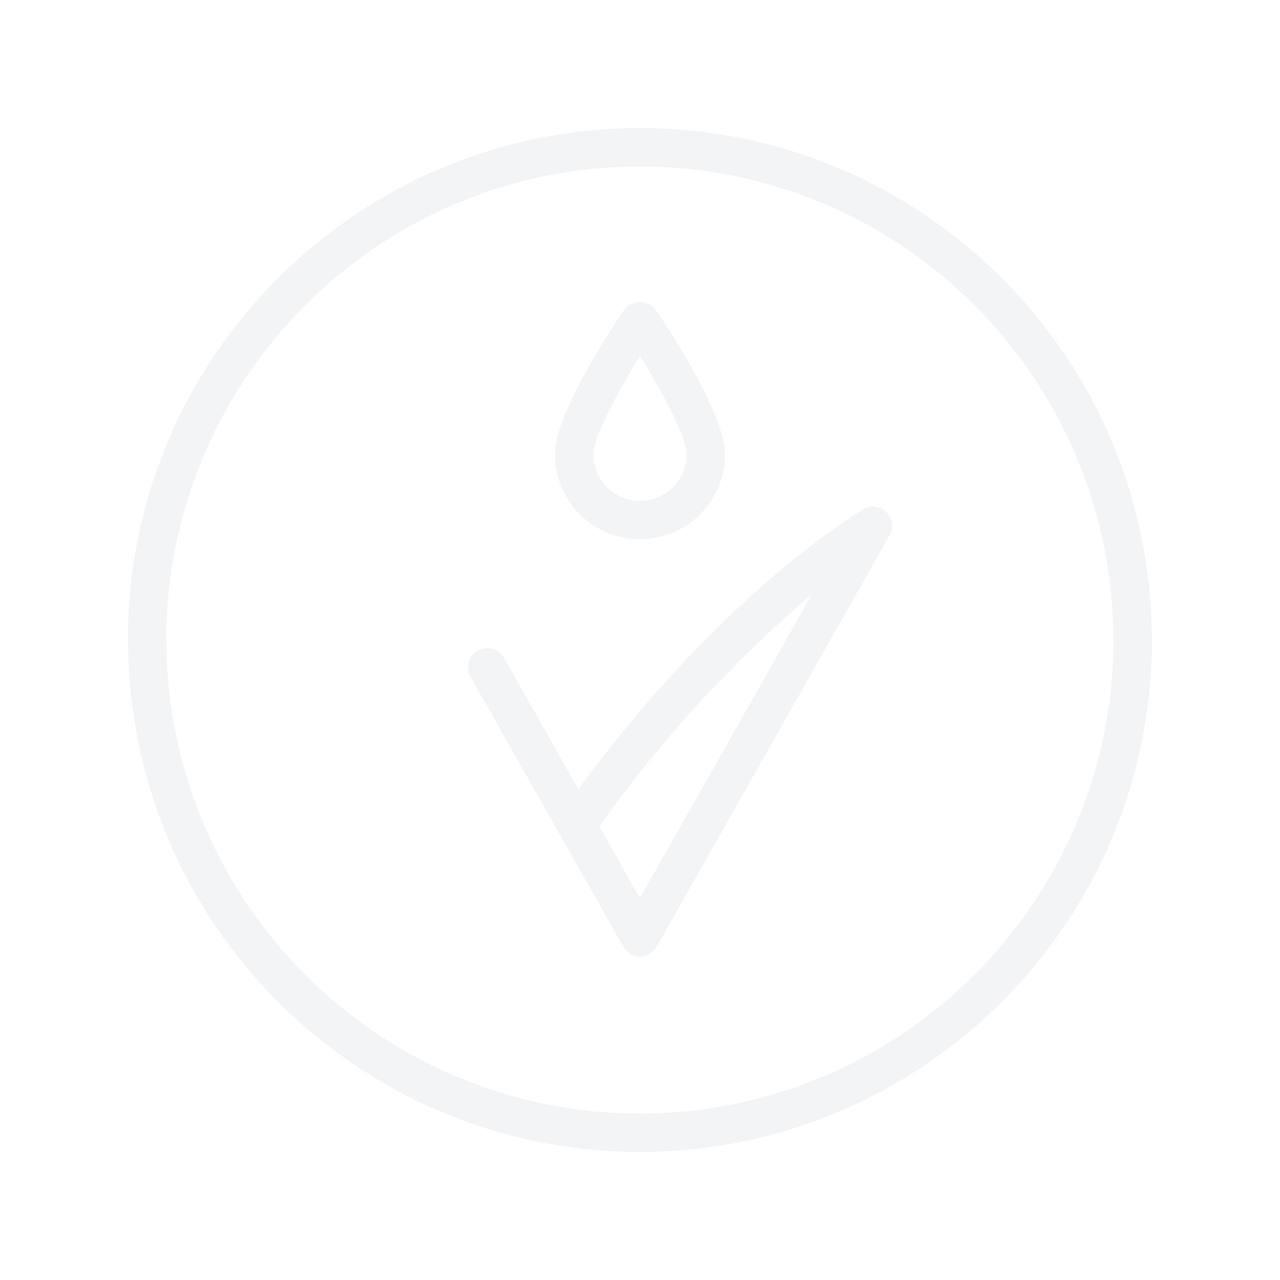 LUMENE Sisu Moisture Remedy Day Cream SPF20 увлажняющий дневной крем для лица SPF20  50ml